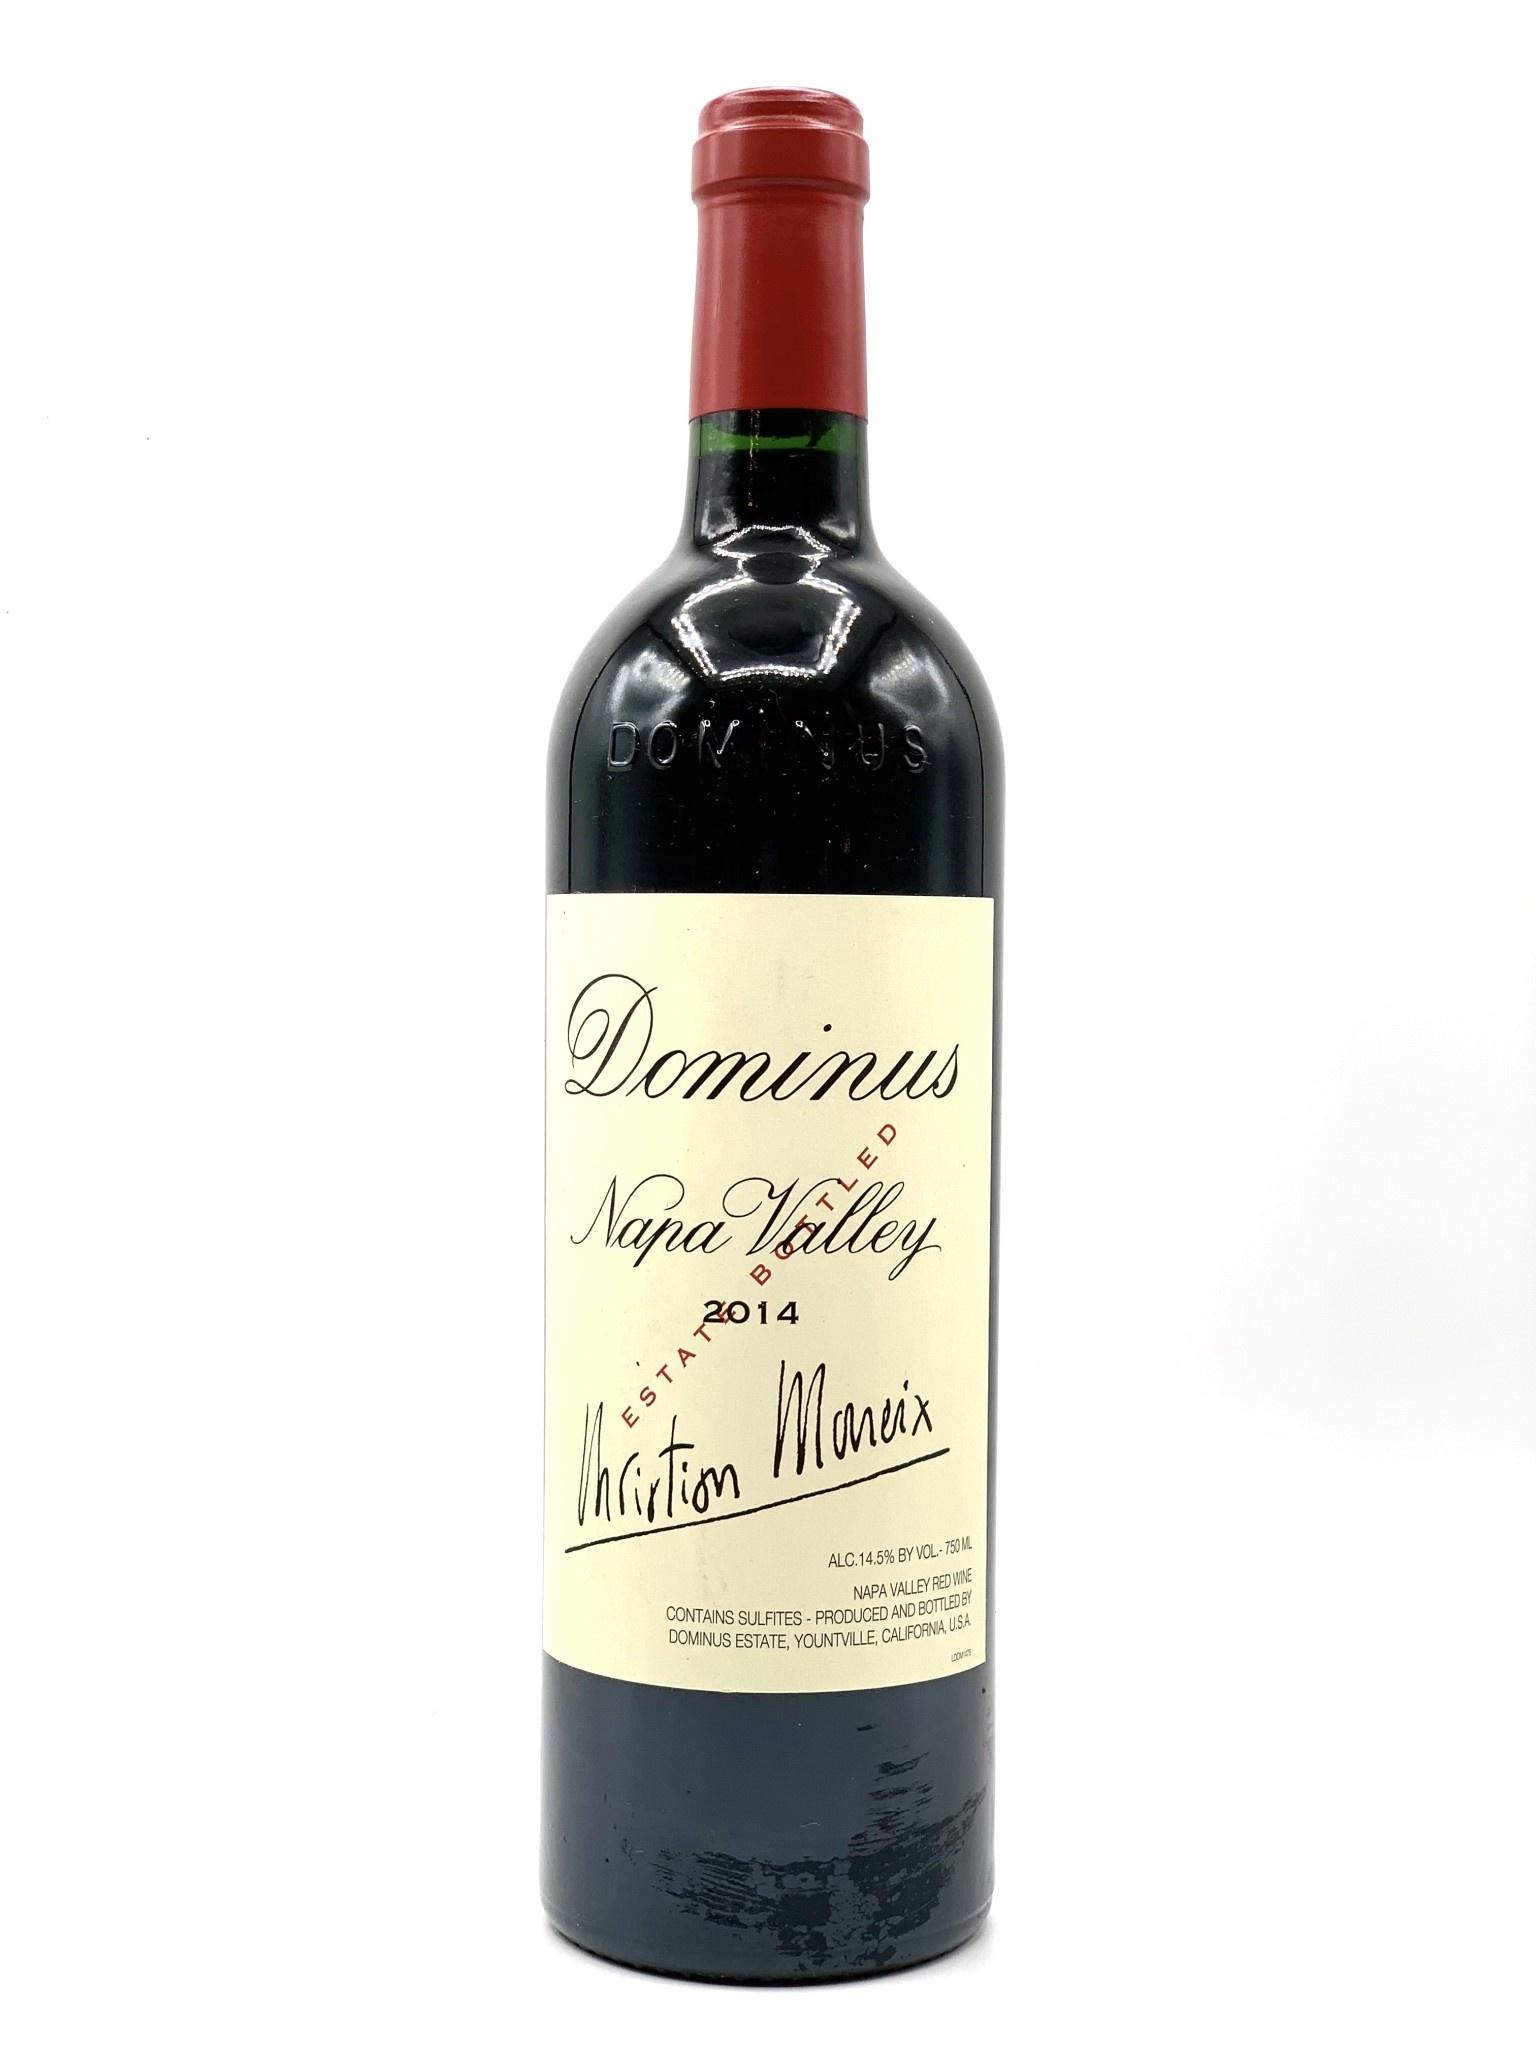 Napa Valley Red 2014 Dominus Estate 750ml